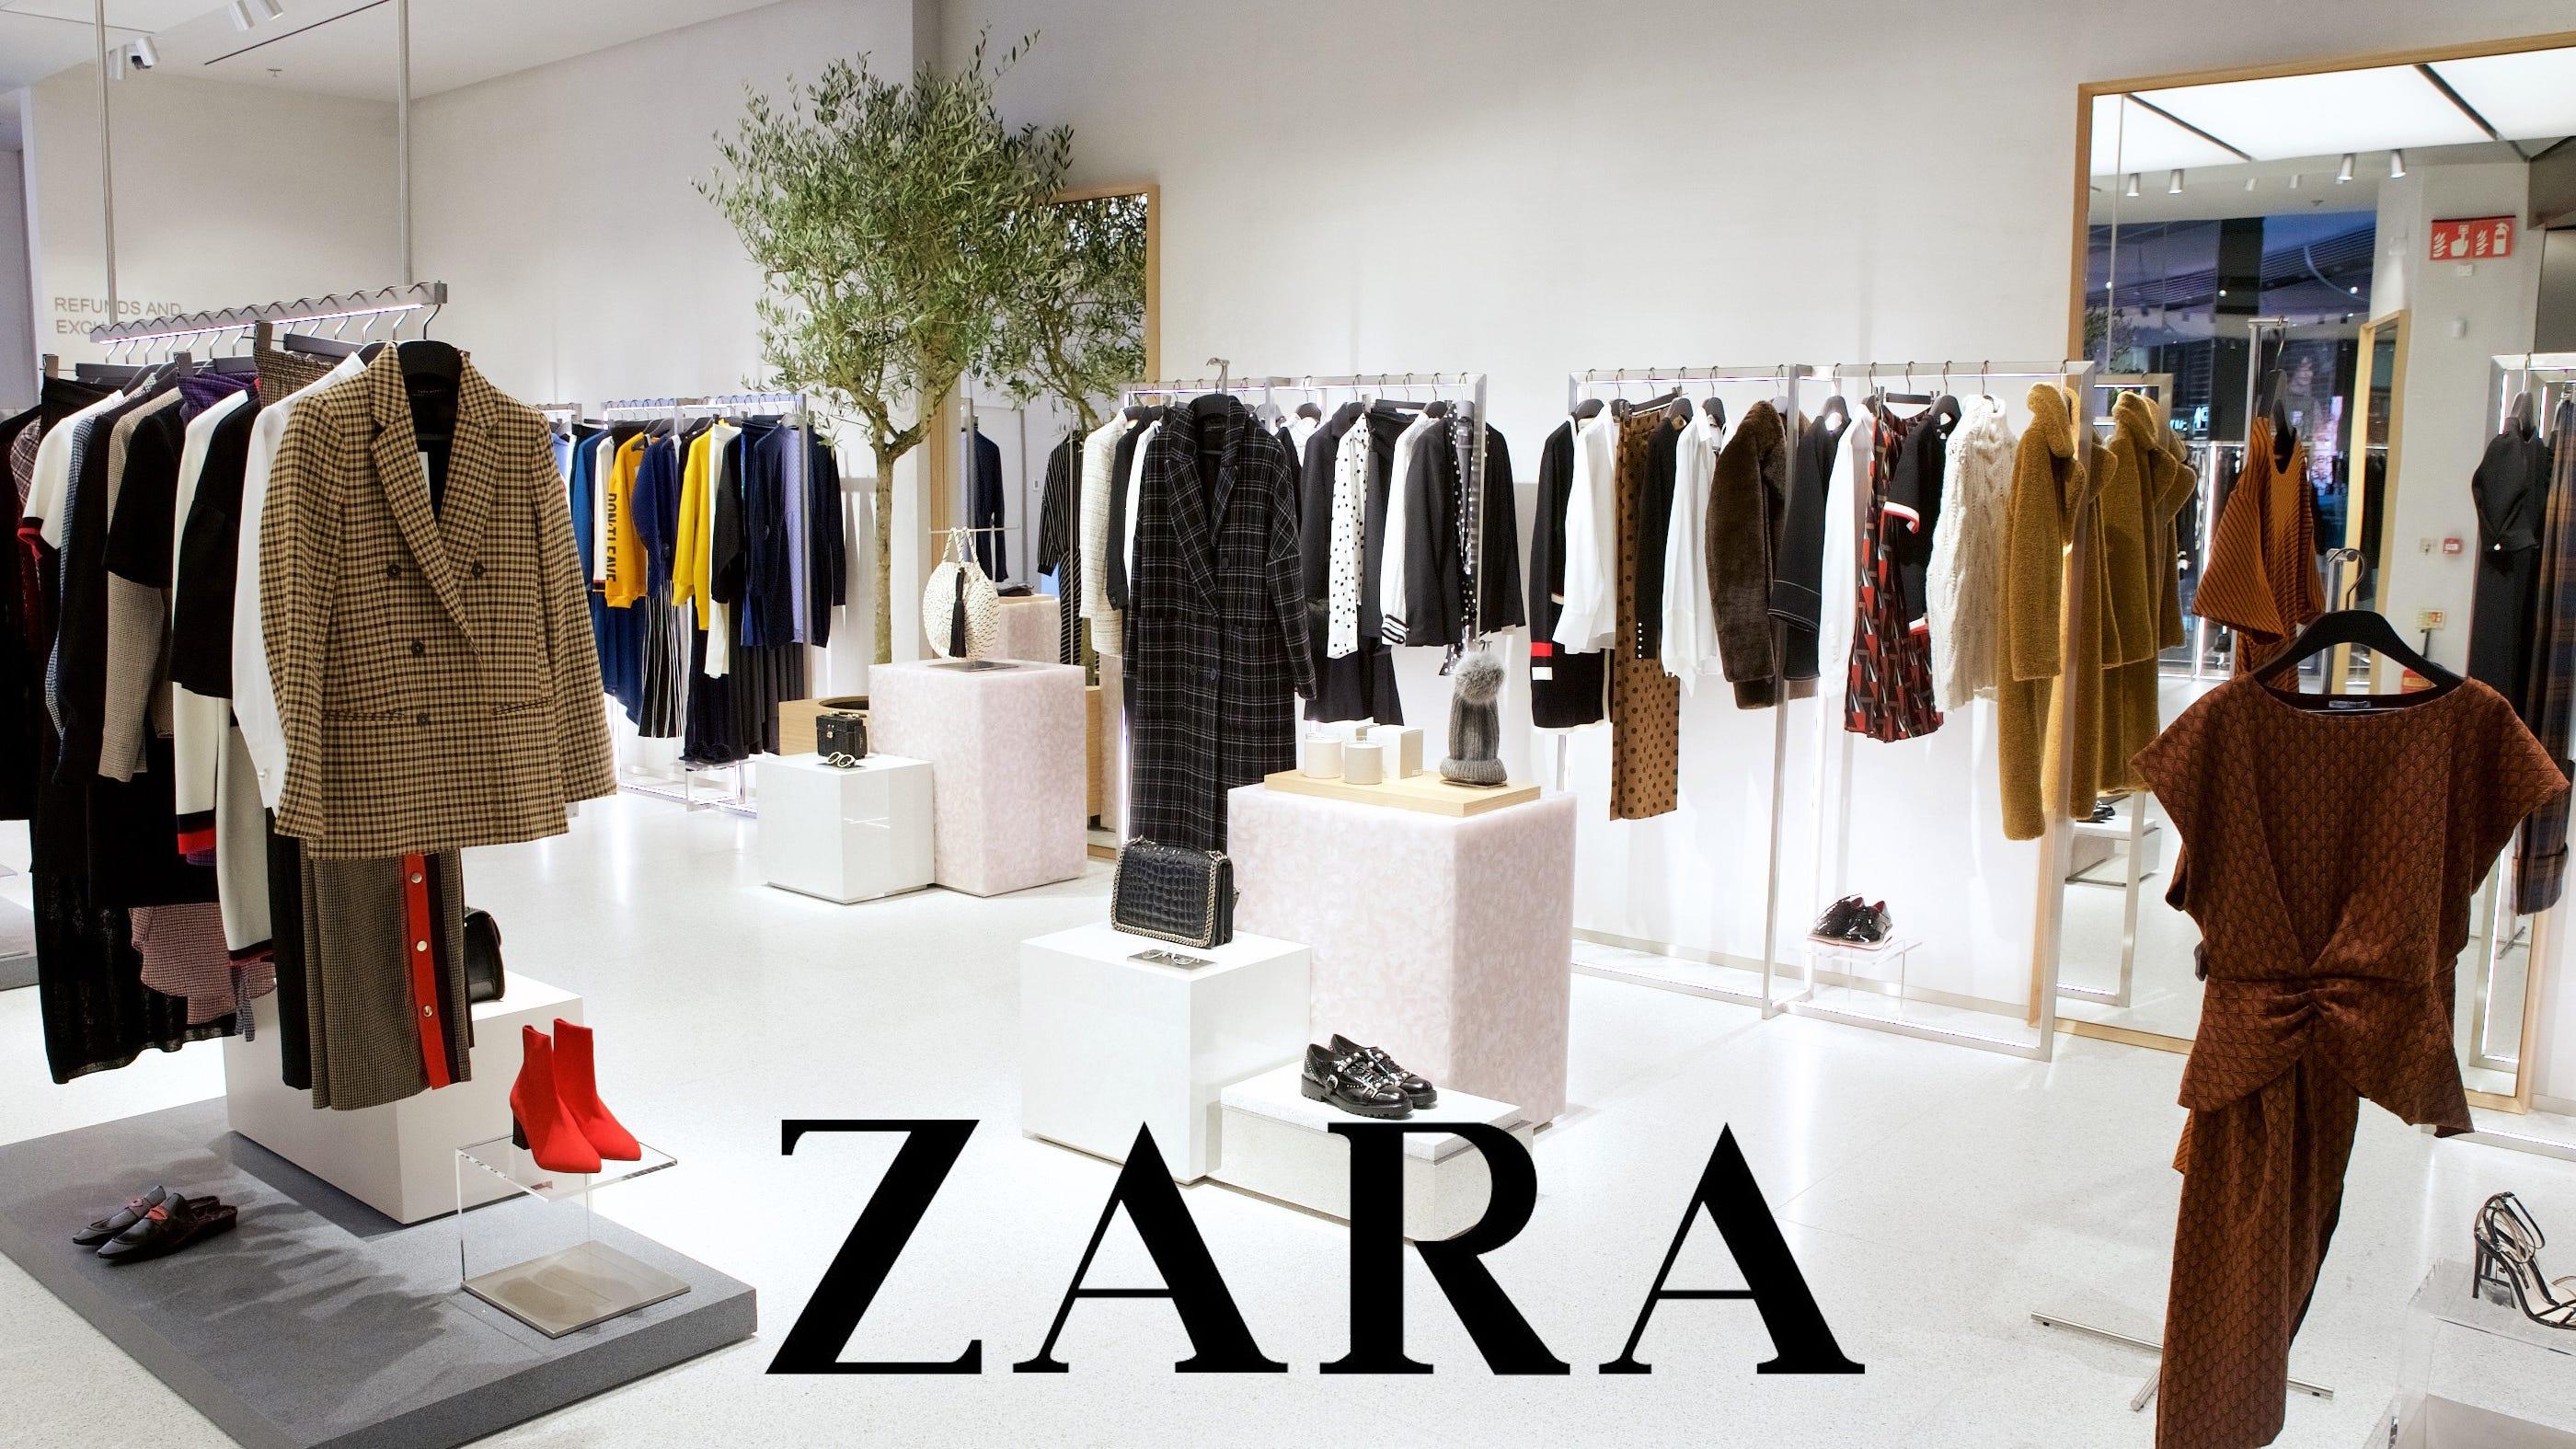 Zara schmuck online